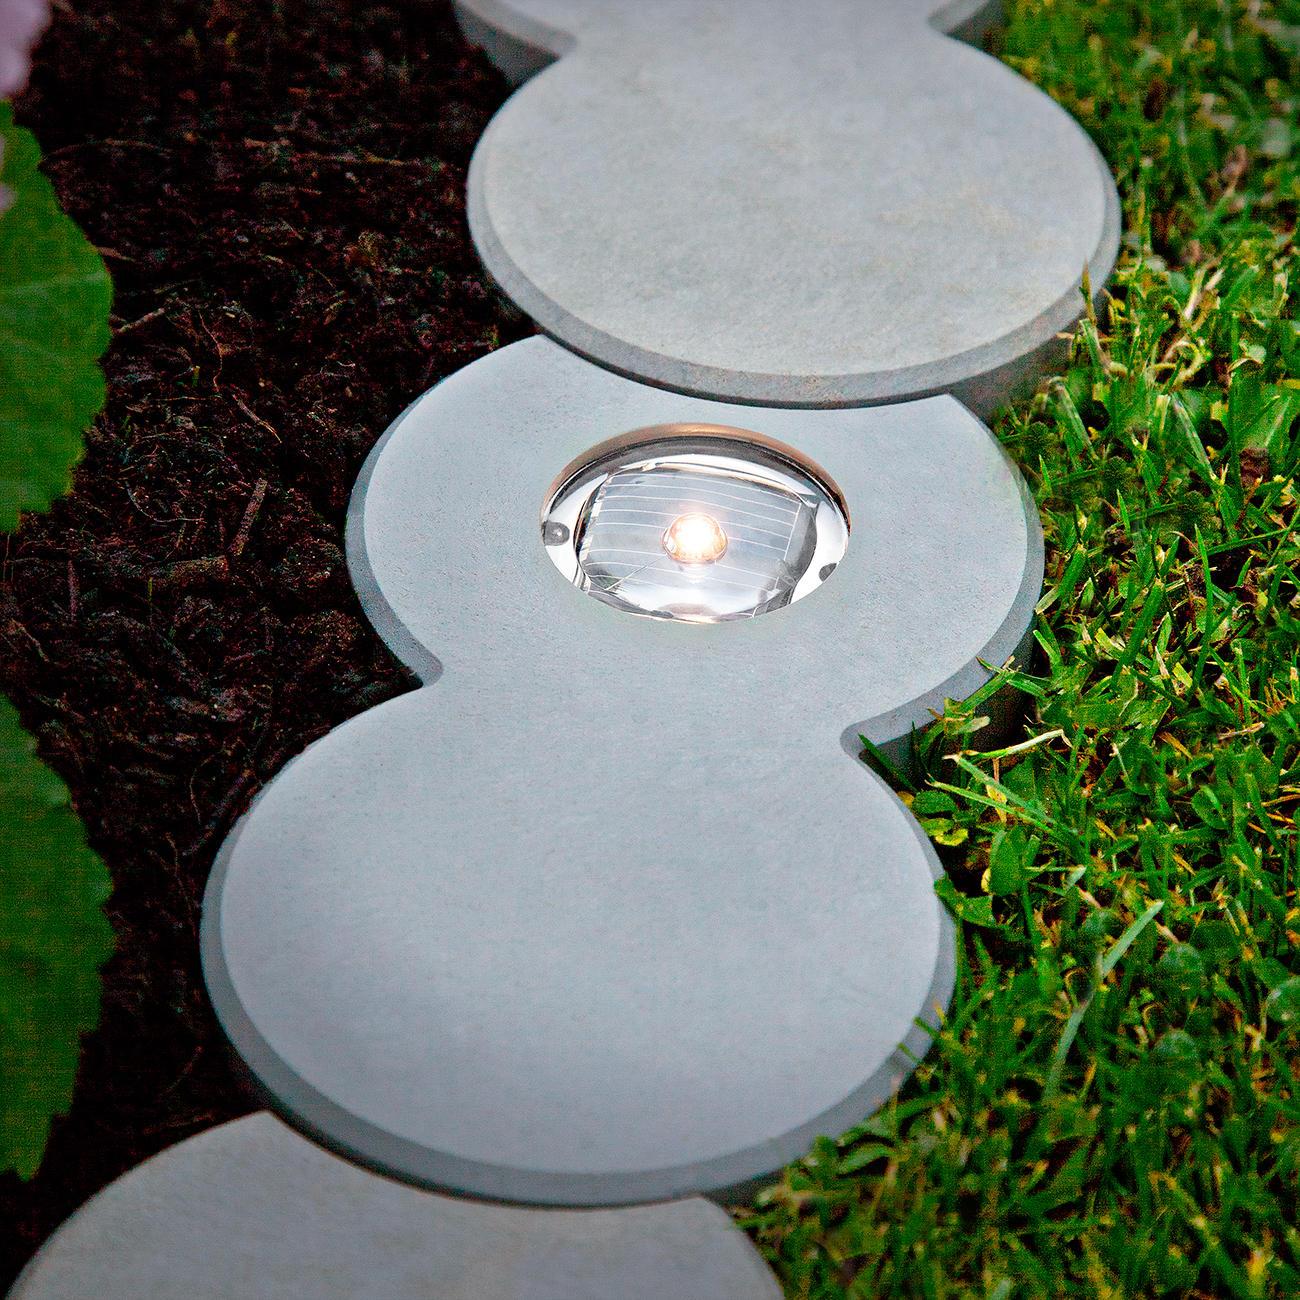 bio rasenkante rasenkantensteine 22 x 10 x 5 5 cm 12er set inkl schlussstein granitgrau. Black Bedroom Furniture Sets. Home Design Ideas